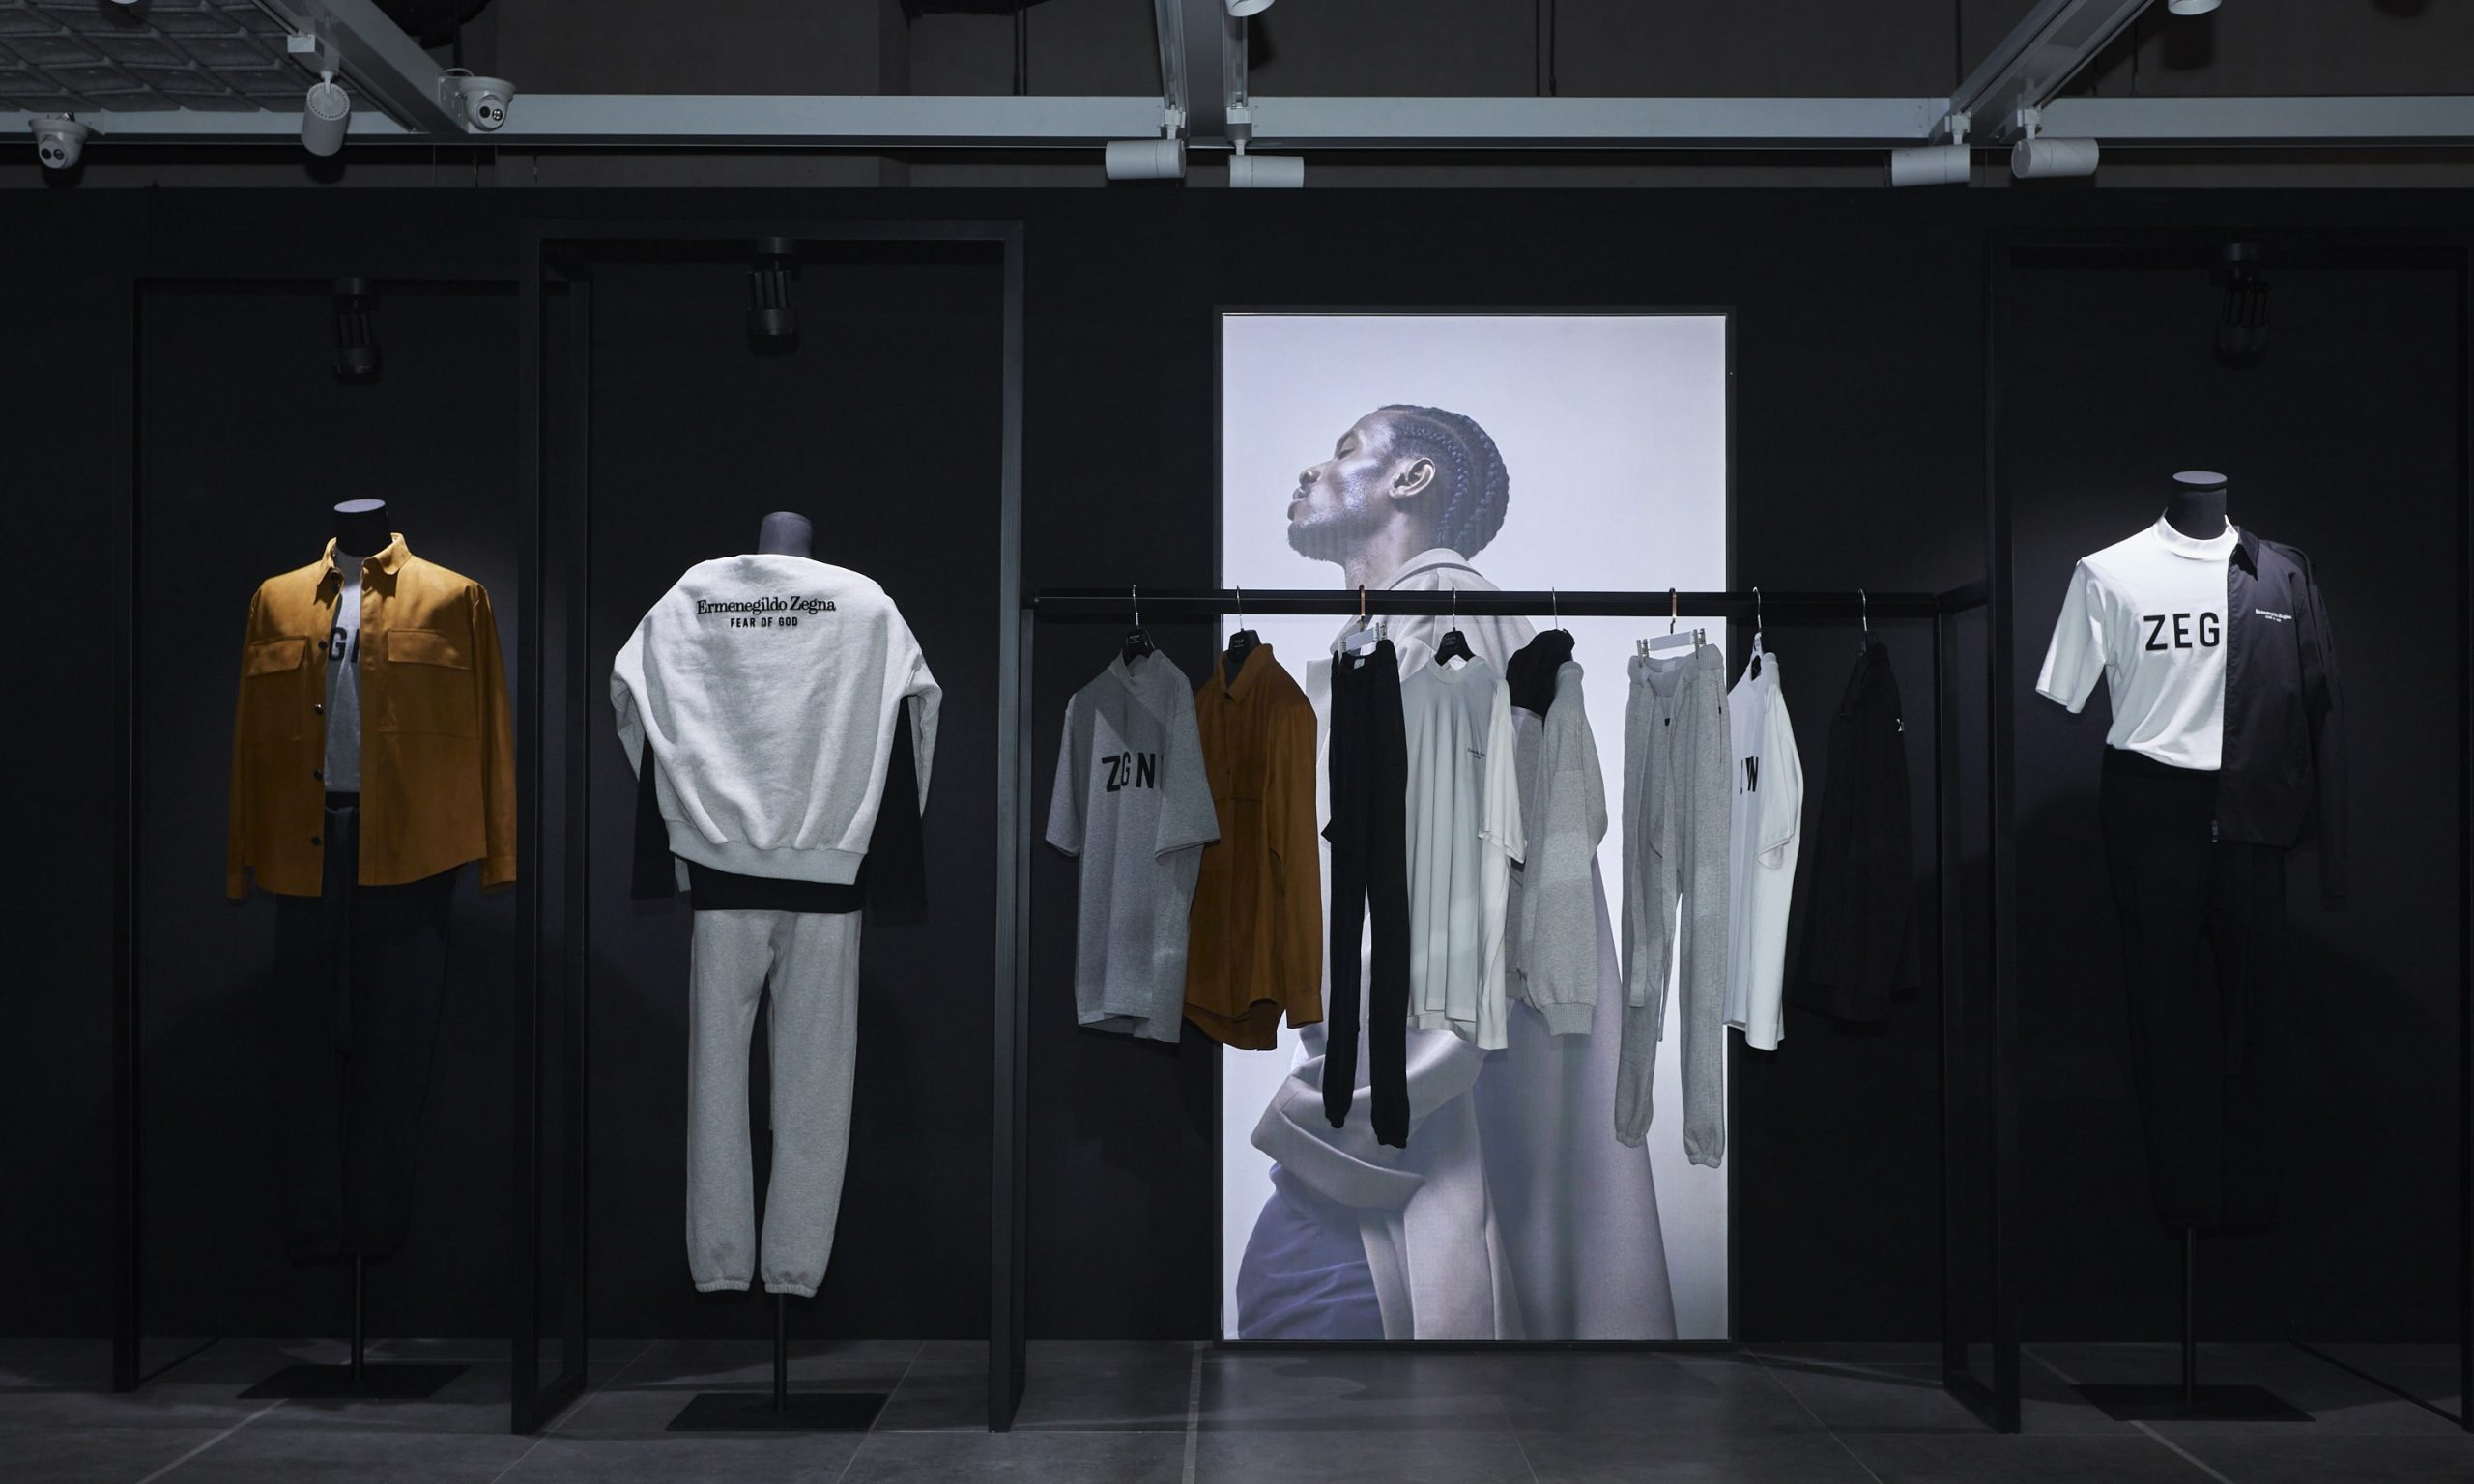 INNERSECT 于 TX 淮海旗舰店正式发售 ZEGNA x FEAR OF GOD 限量联名系列